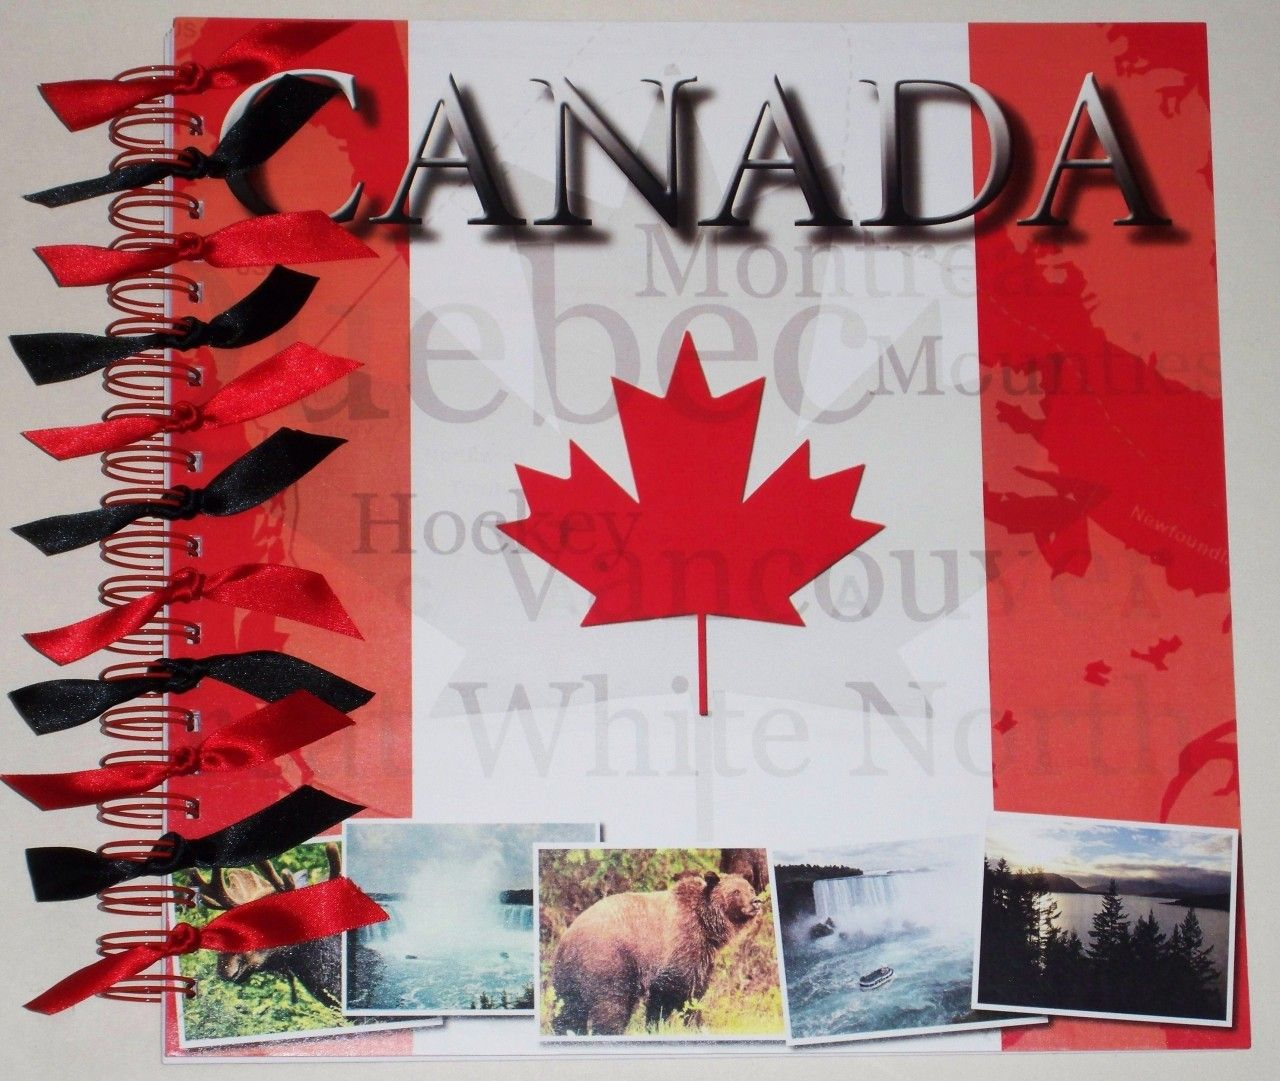 How to scrapbook memories - Scrapbook My Memories 12x12 Canada Holiday Travel Personalised Scrapbook Memory Book Photo